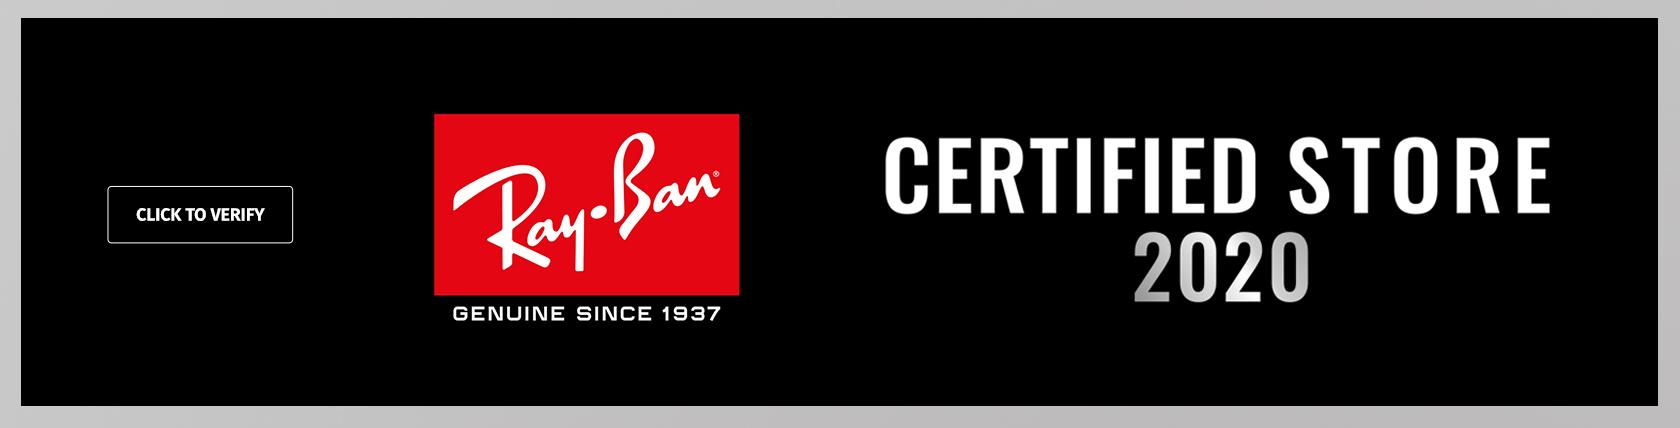 Videt este Certified Reseller Ray-Ban! Cei mai doriți ochelari Ray-Ban, la super prețuri!